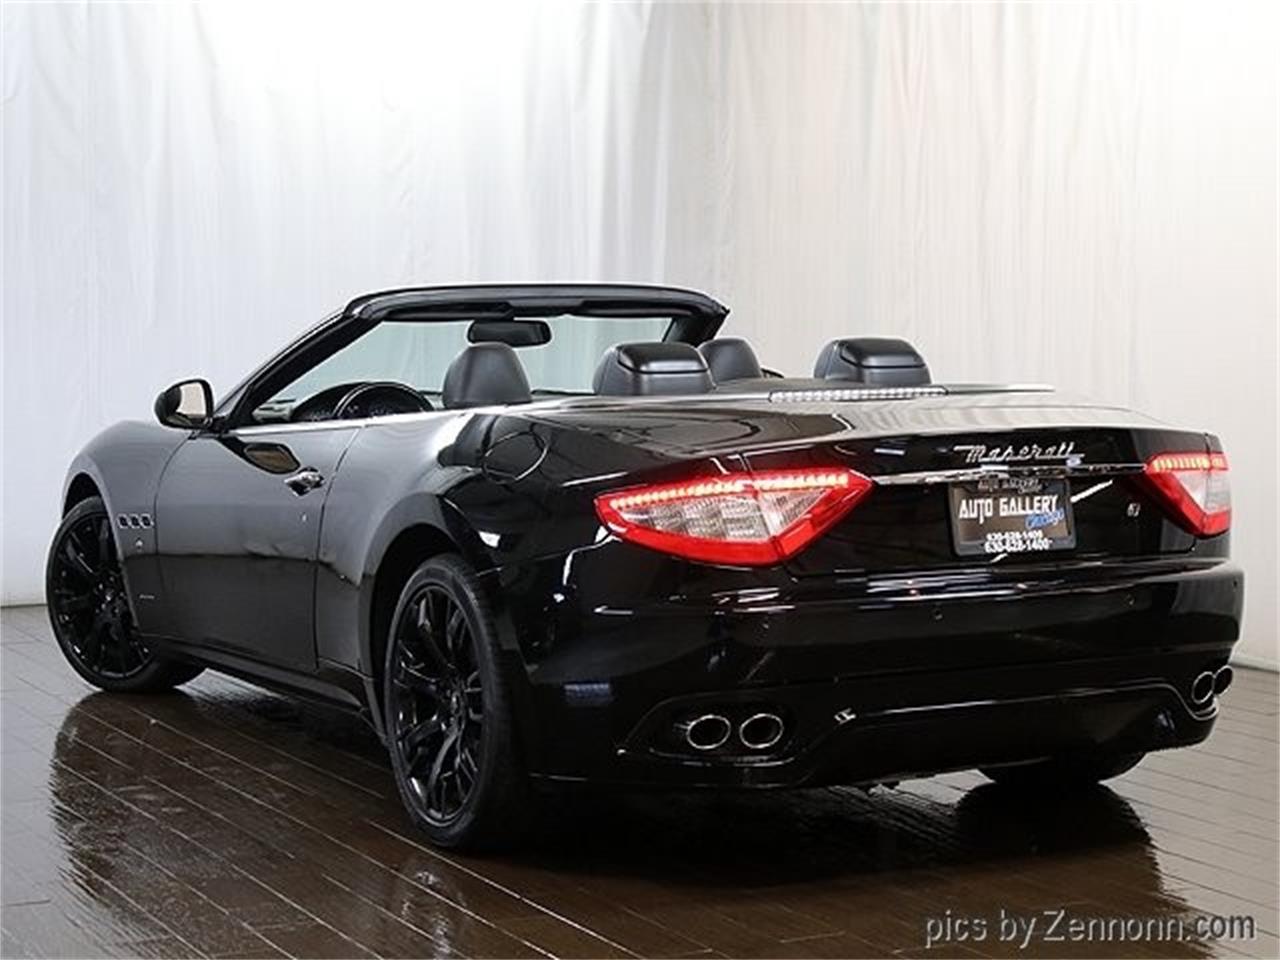 Large Picture of 2011 Maserati GranTurismo located in Illinois - $39,990.00 - QE45